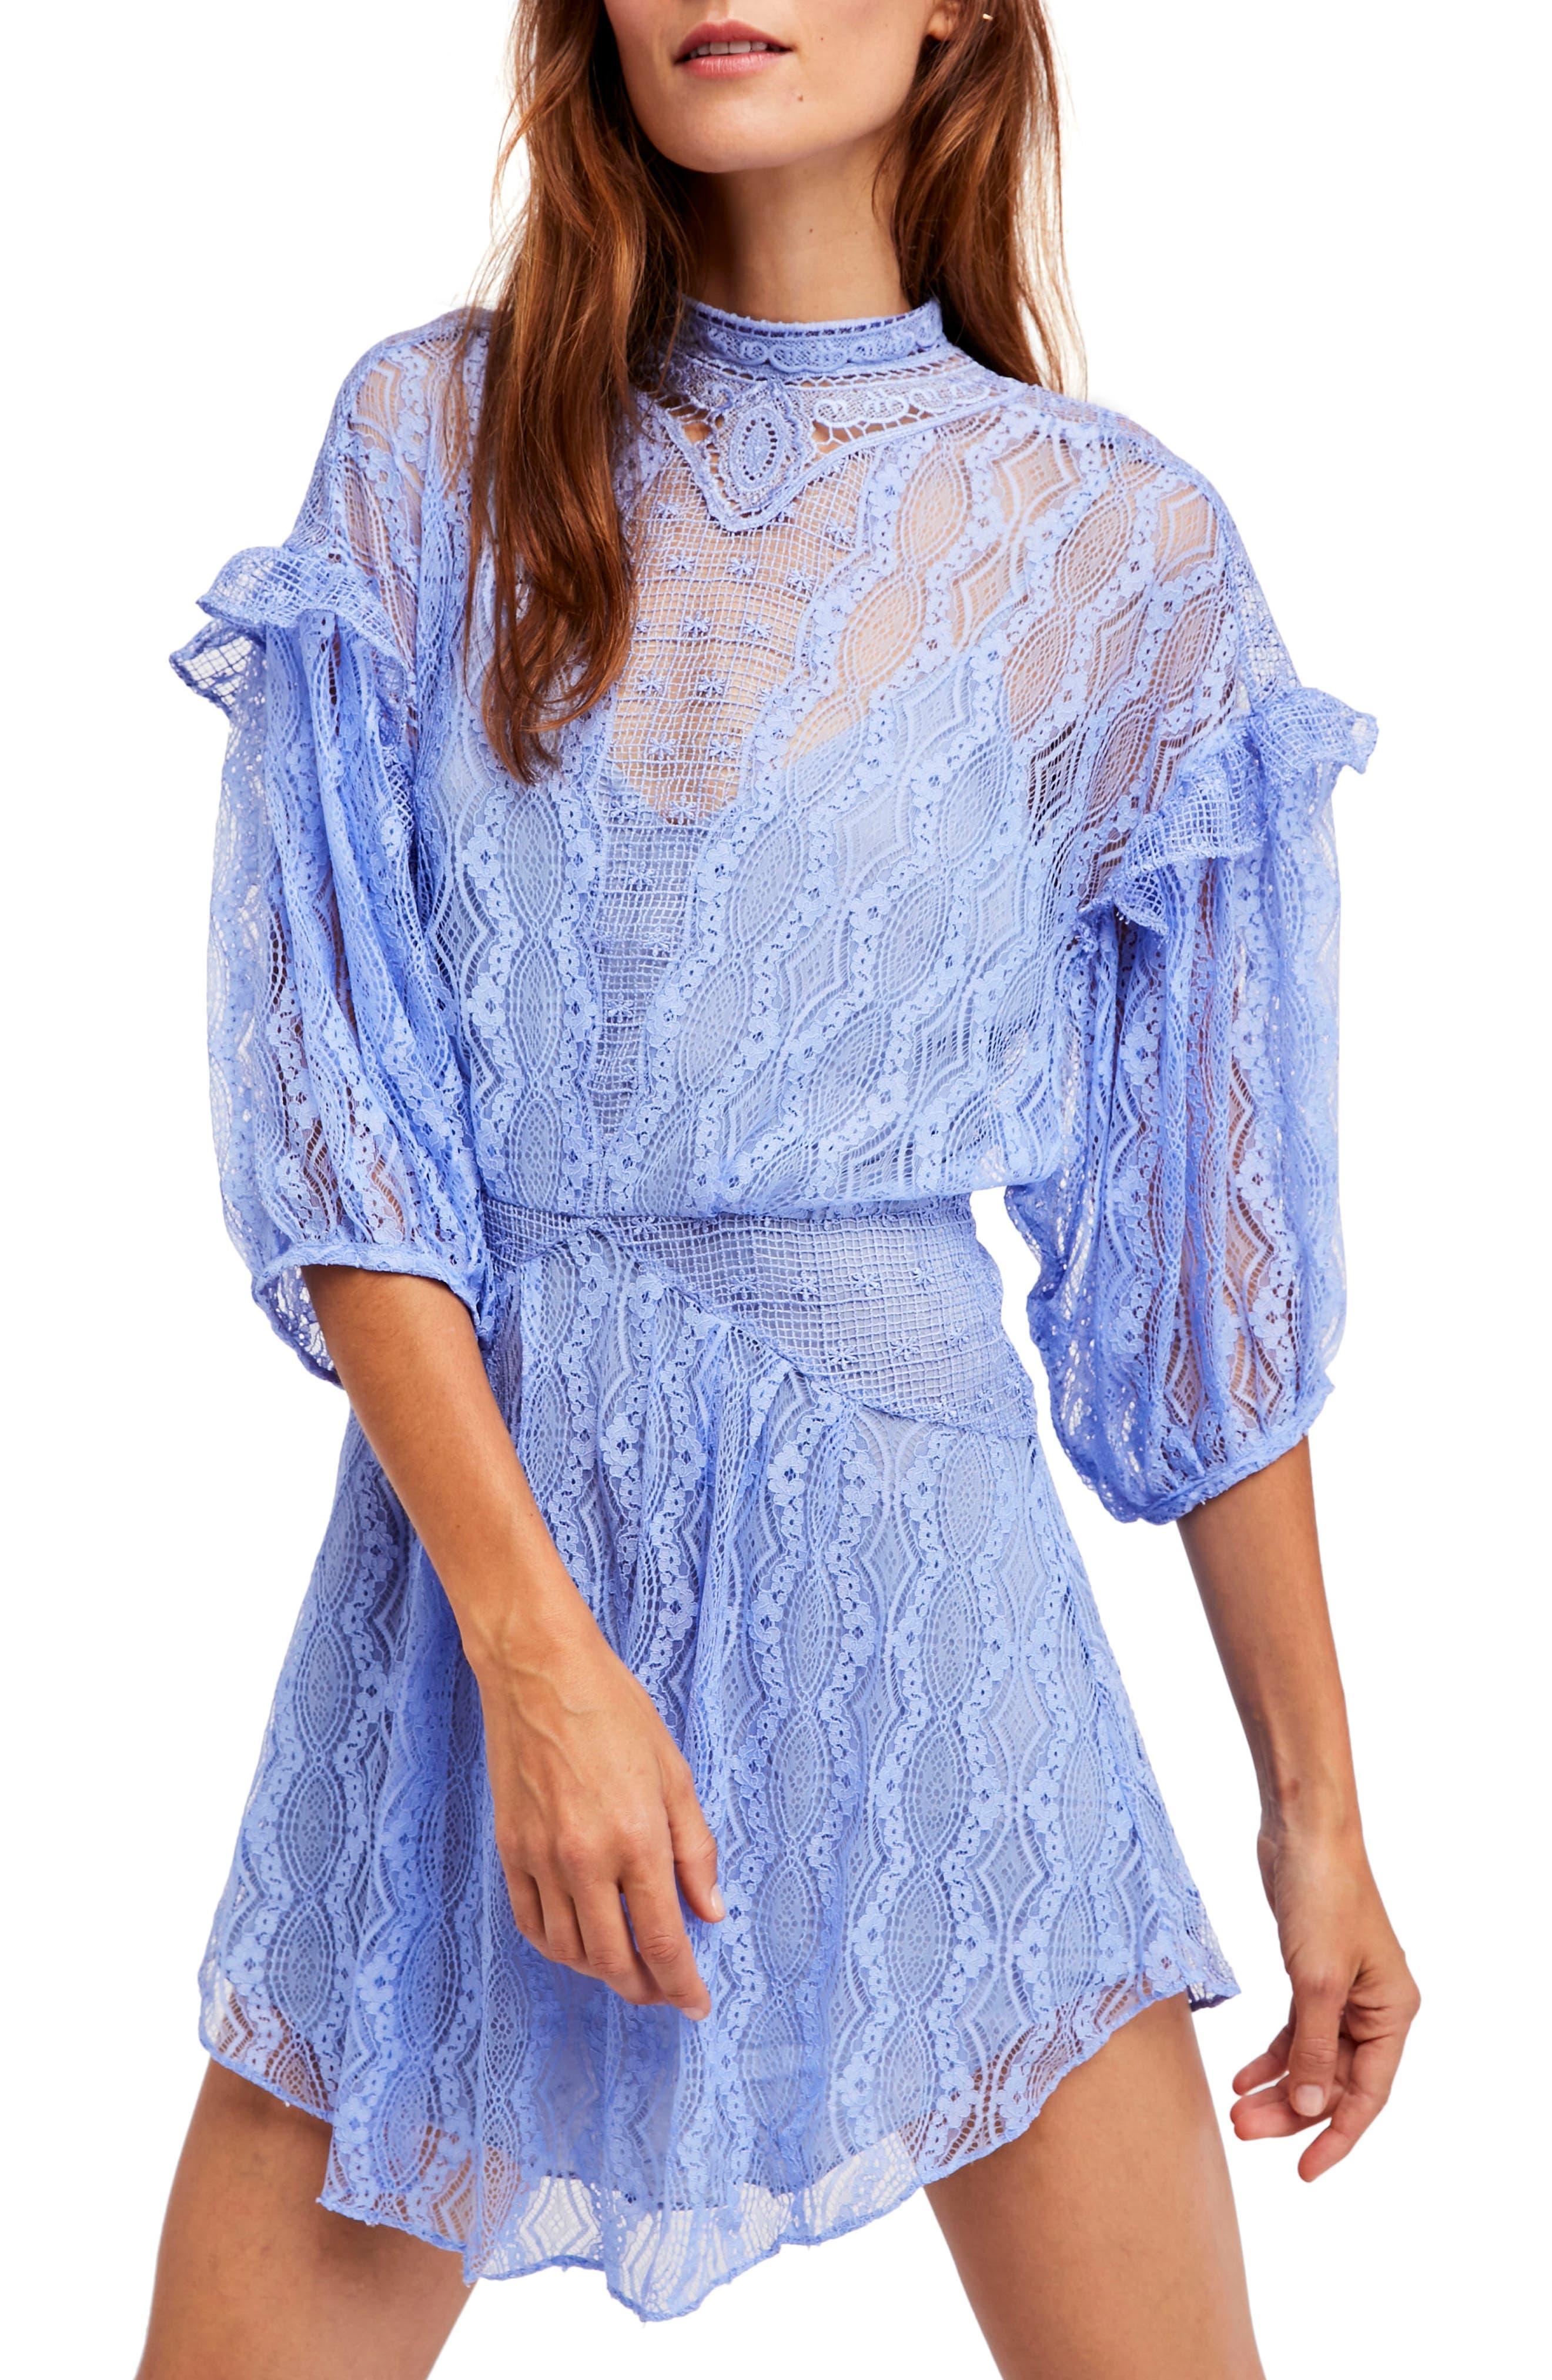 Bittersweet Dolman Sleeve Minidress,                         Main,                         color, Blue